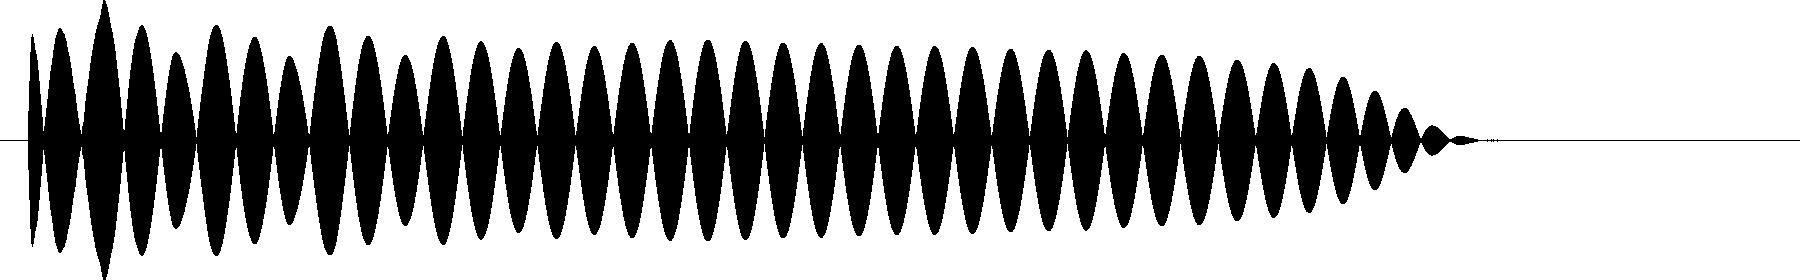 perc 1 26